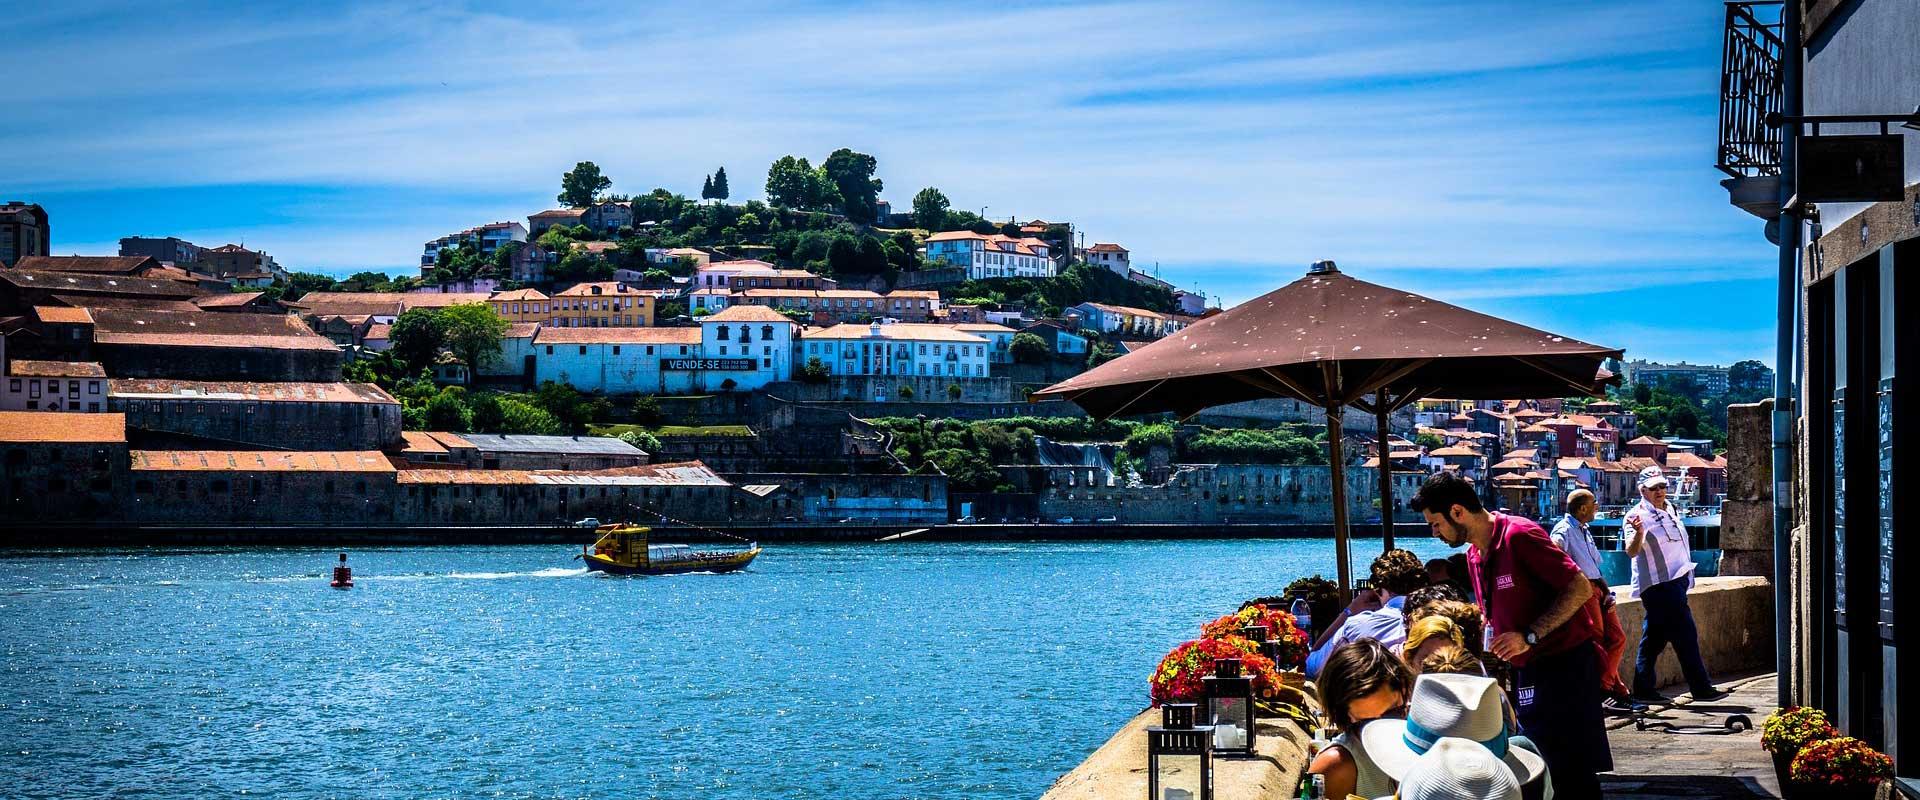 Porto-restaurant-douro-river-boat-6-bridges.jpg